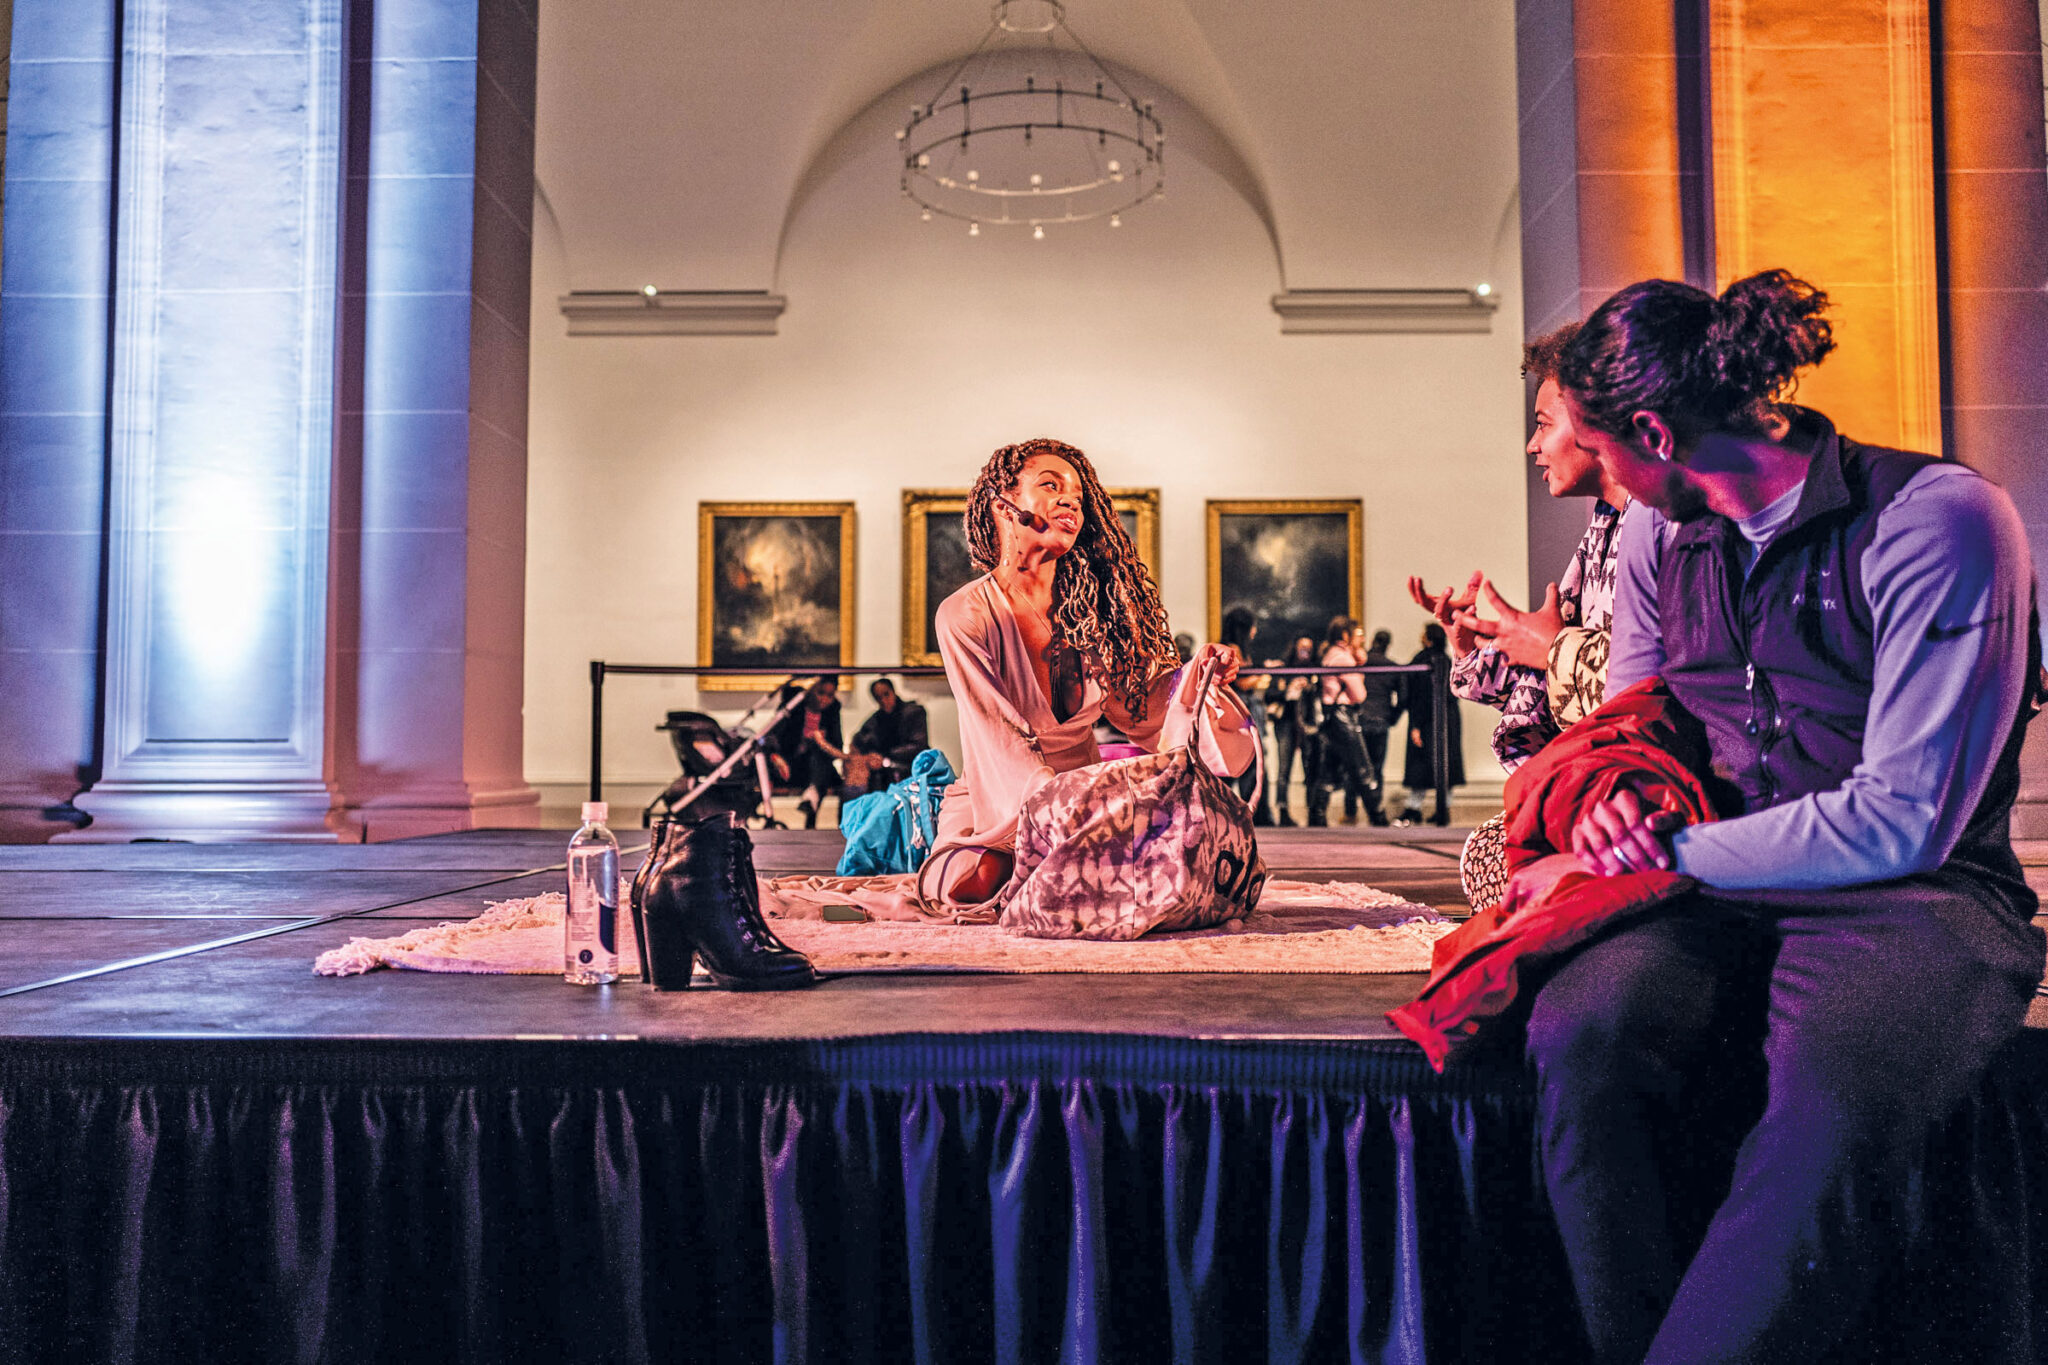 Heal Haus - Inside the The Brooklyn Museum teaching meditation